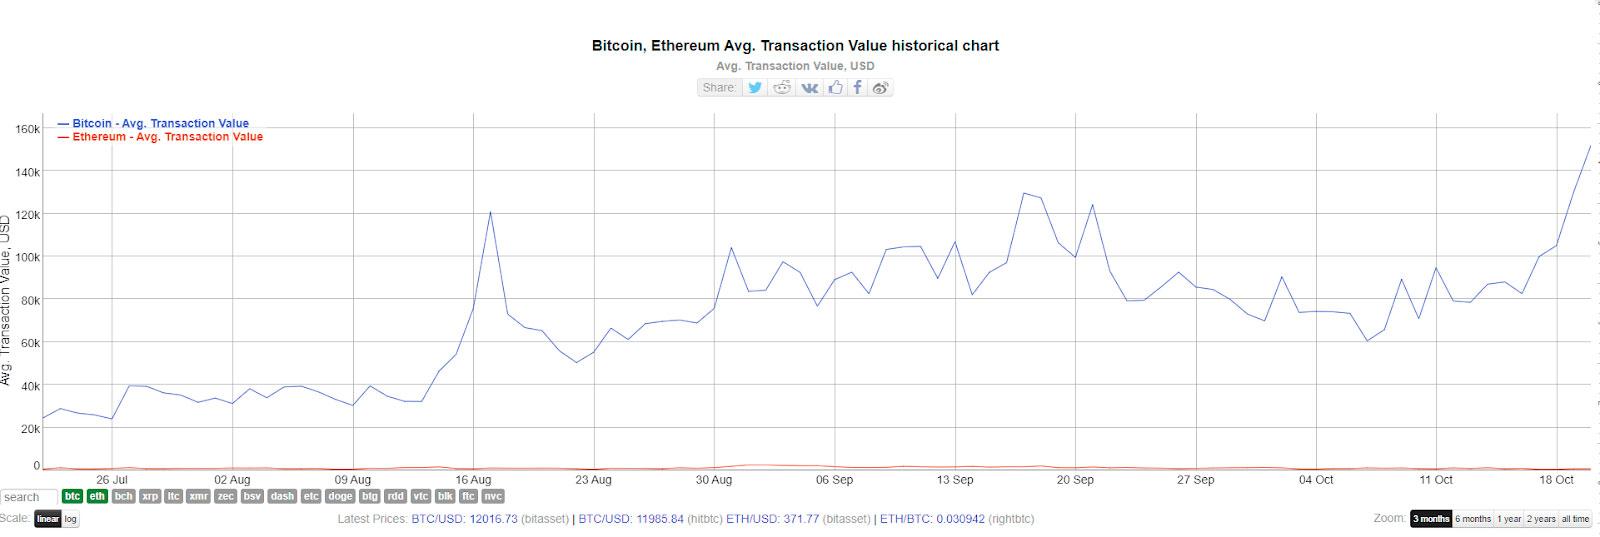 Valor promedio de transaccion de Bitcoin. Fuente: BitInfoCharts